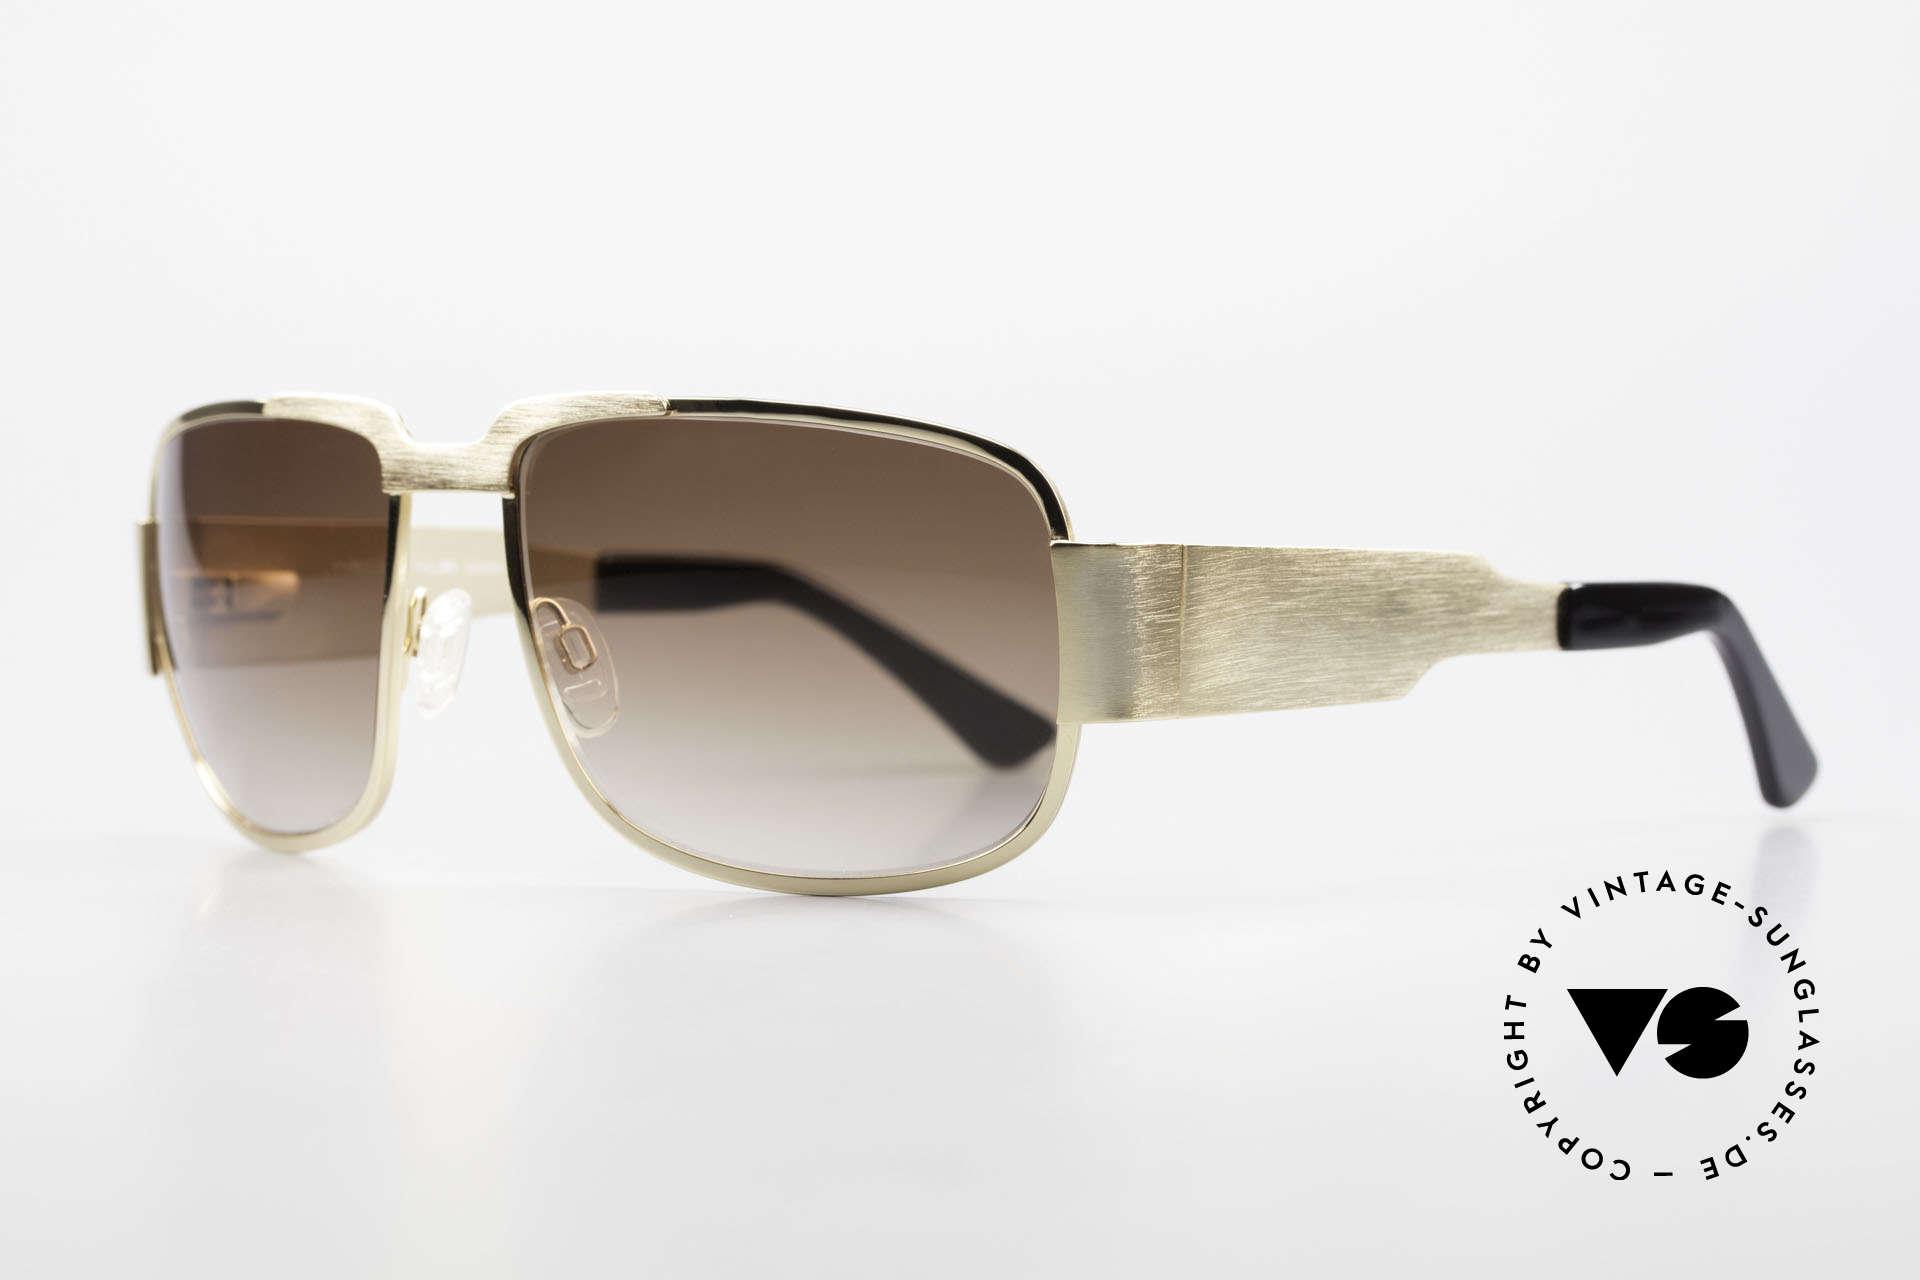 Neostyle Nautic 2 Brad Pitt Tarantino Sunglasses, Brad Pitt wears the shades on the plane from Rome to LA, Made for Men